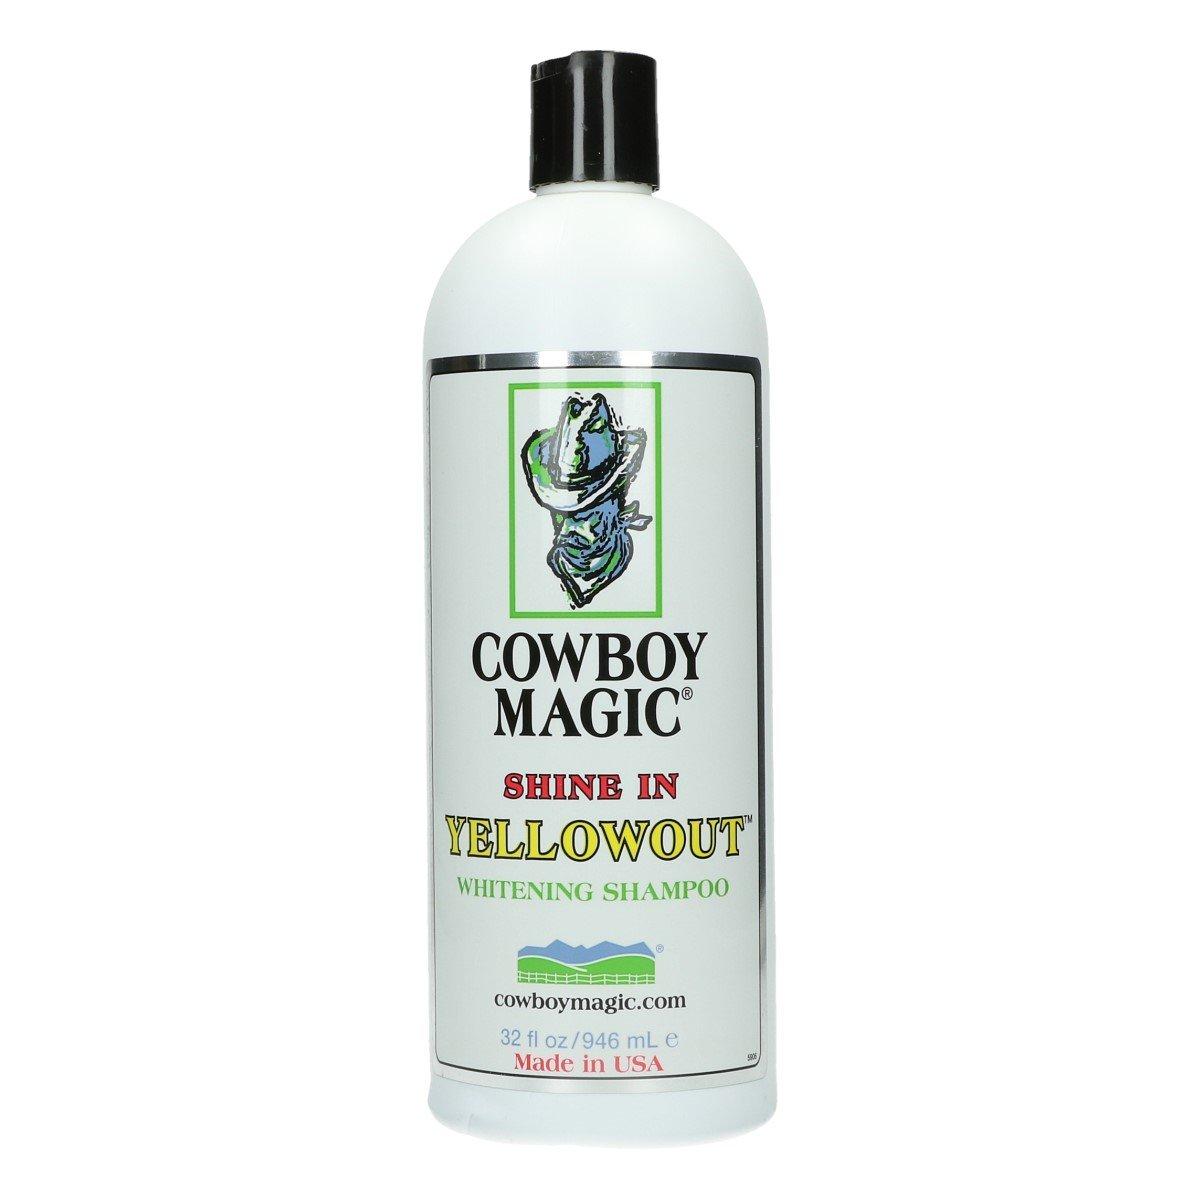 Afbeelding van Cowboy Magic Shine In Yellow Out Shampoo 946ml